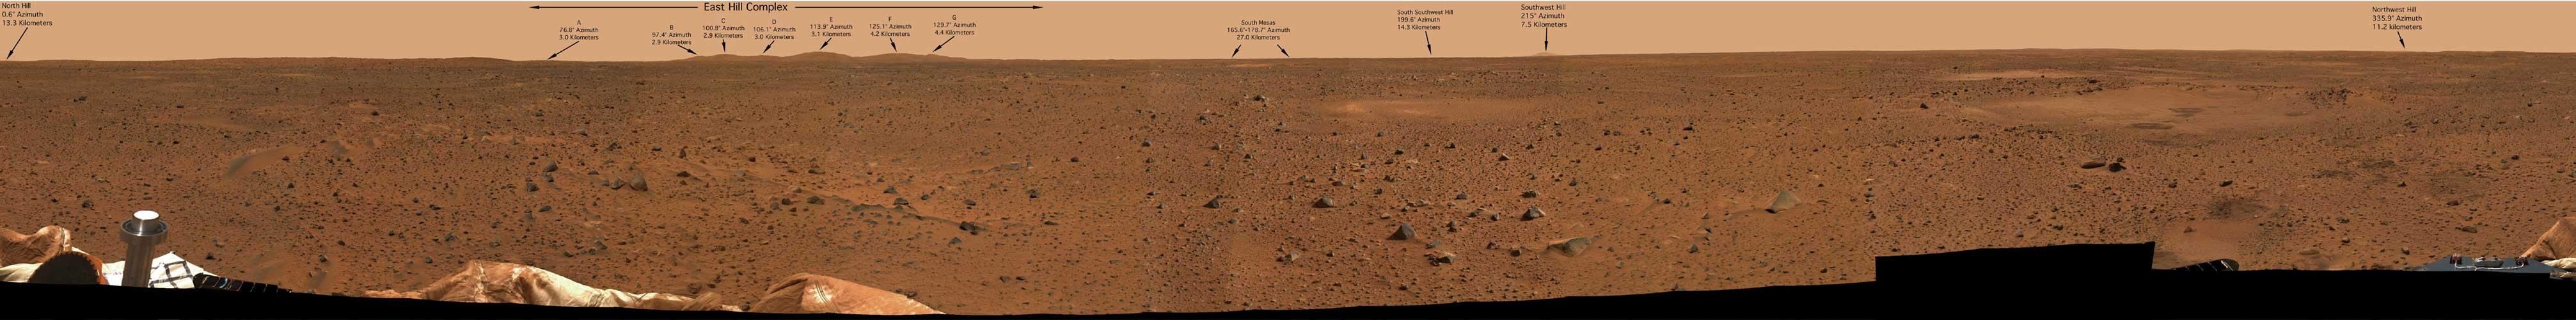 Panorama annoté de Mars